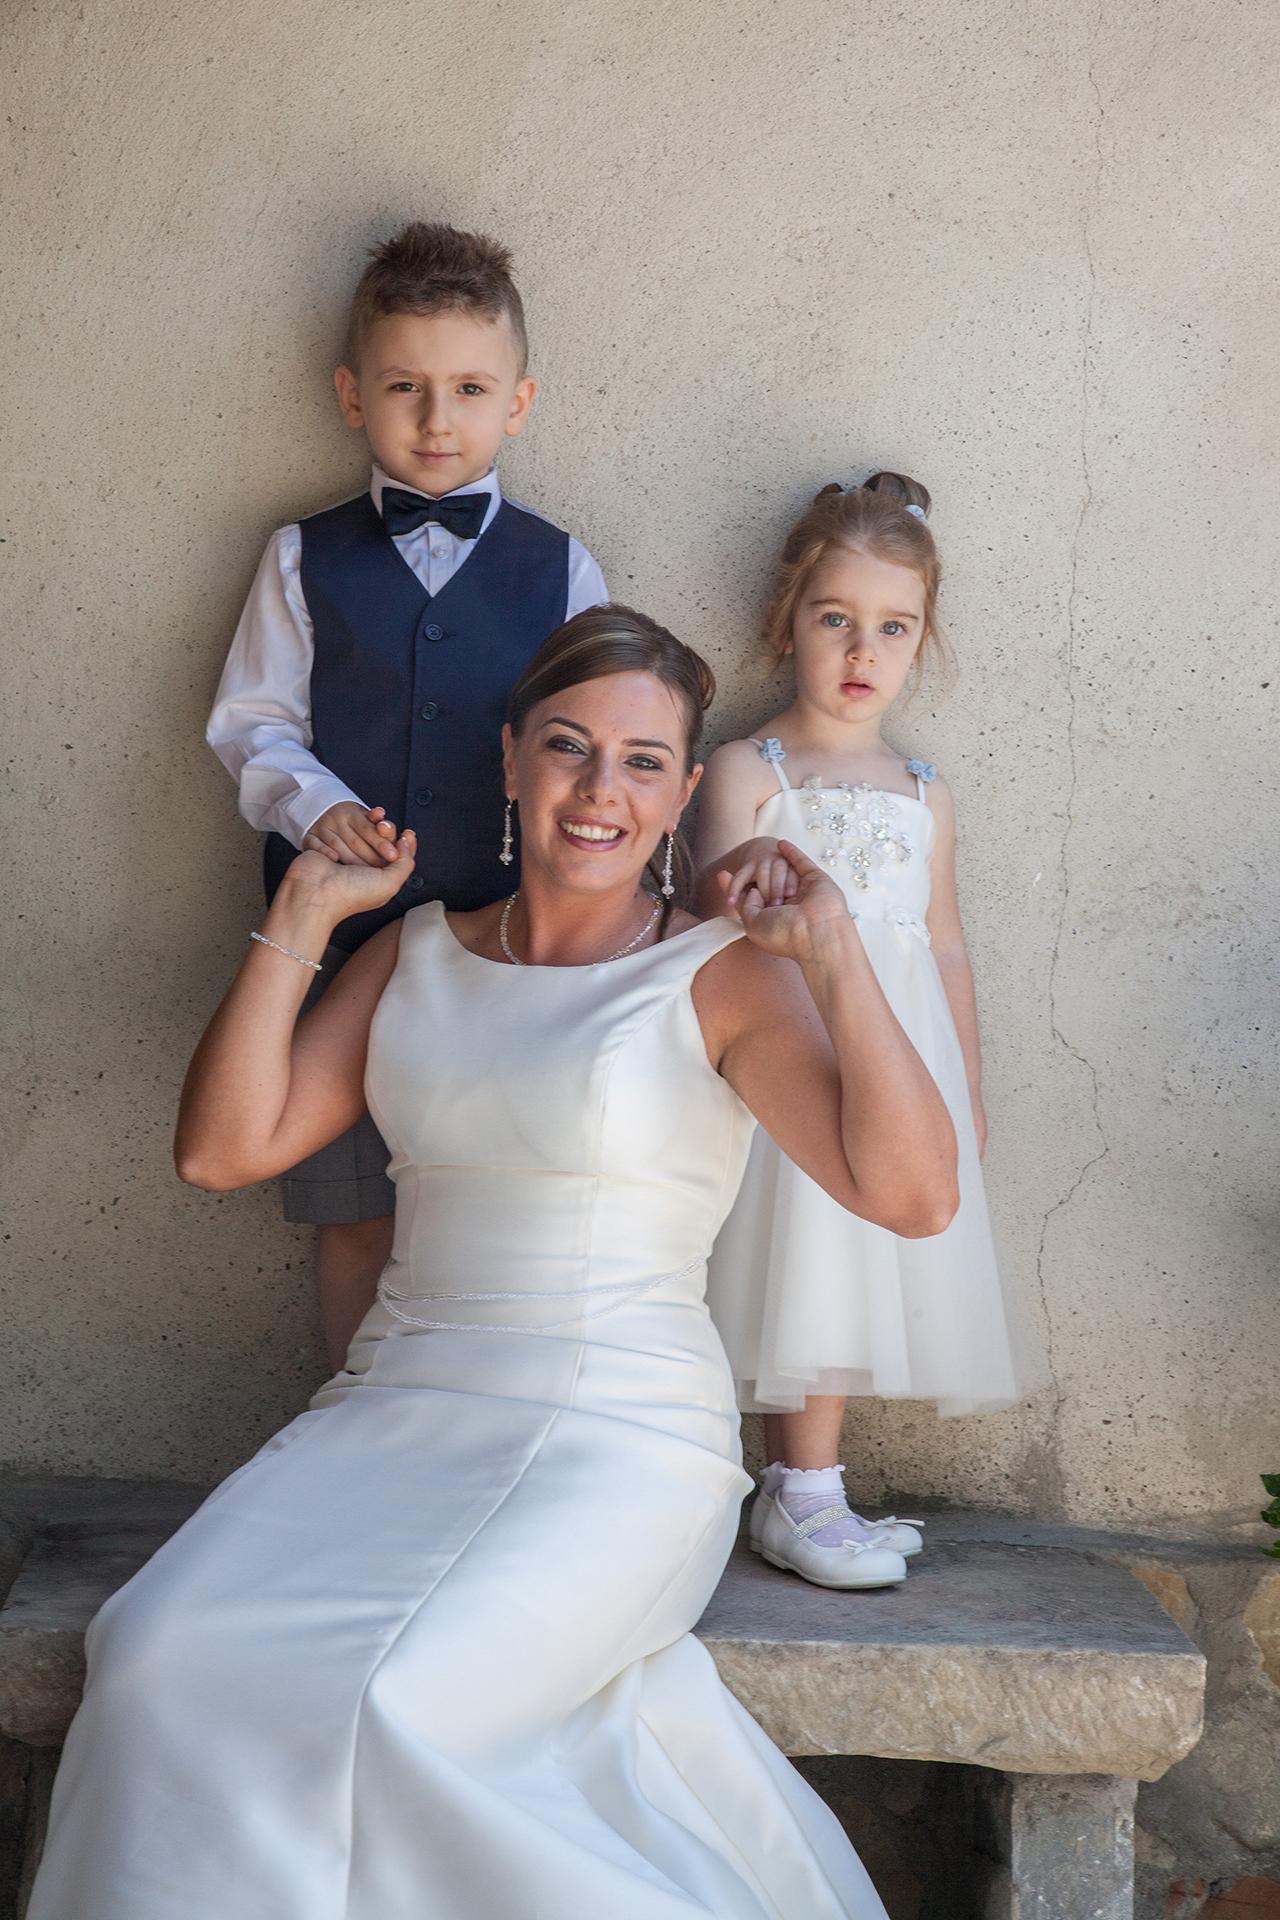 Matrimonio a Castelmezzano: Ferdinando e Annalisa Fotografo matrimonio